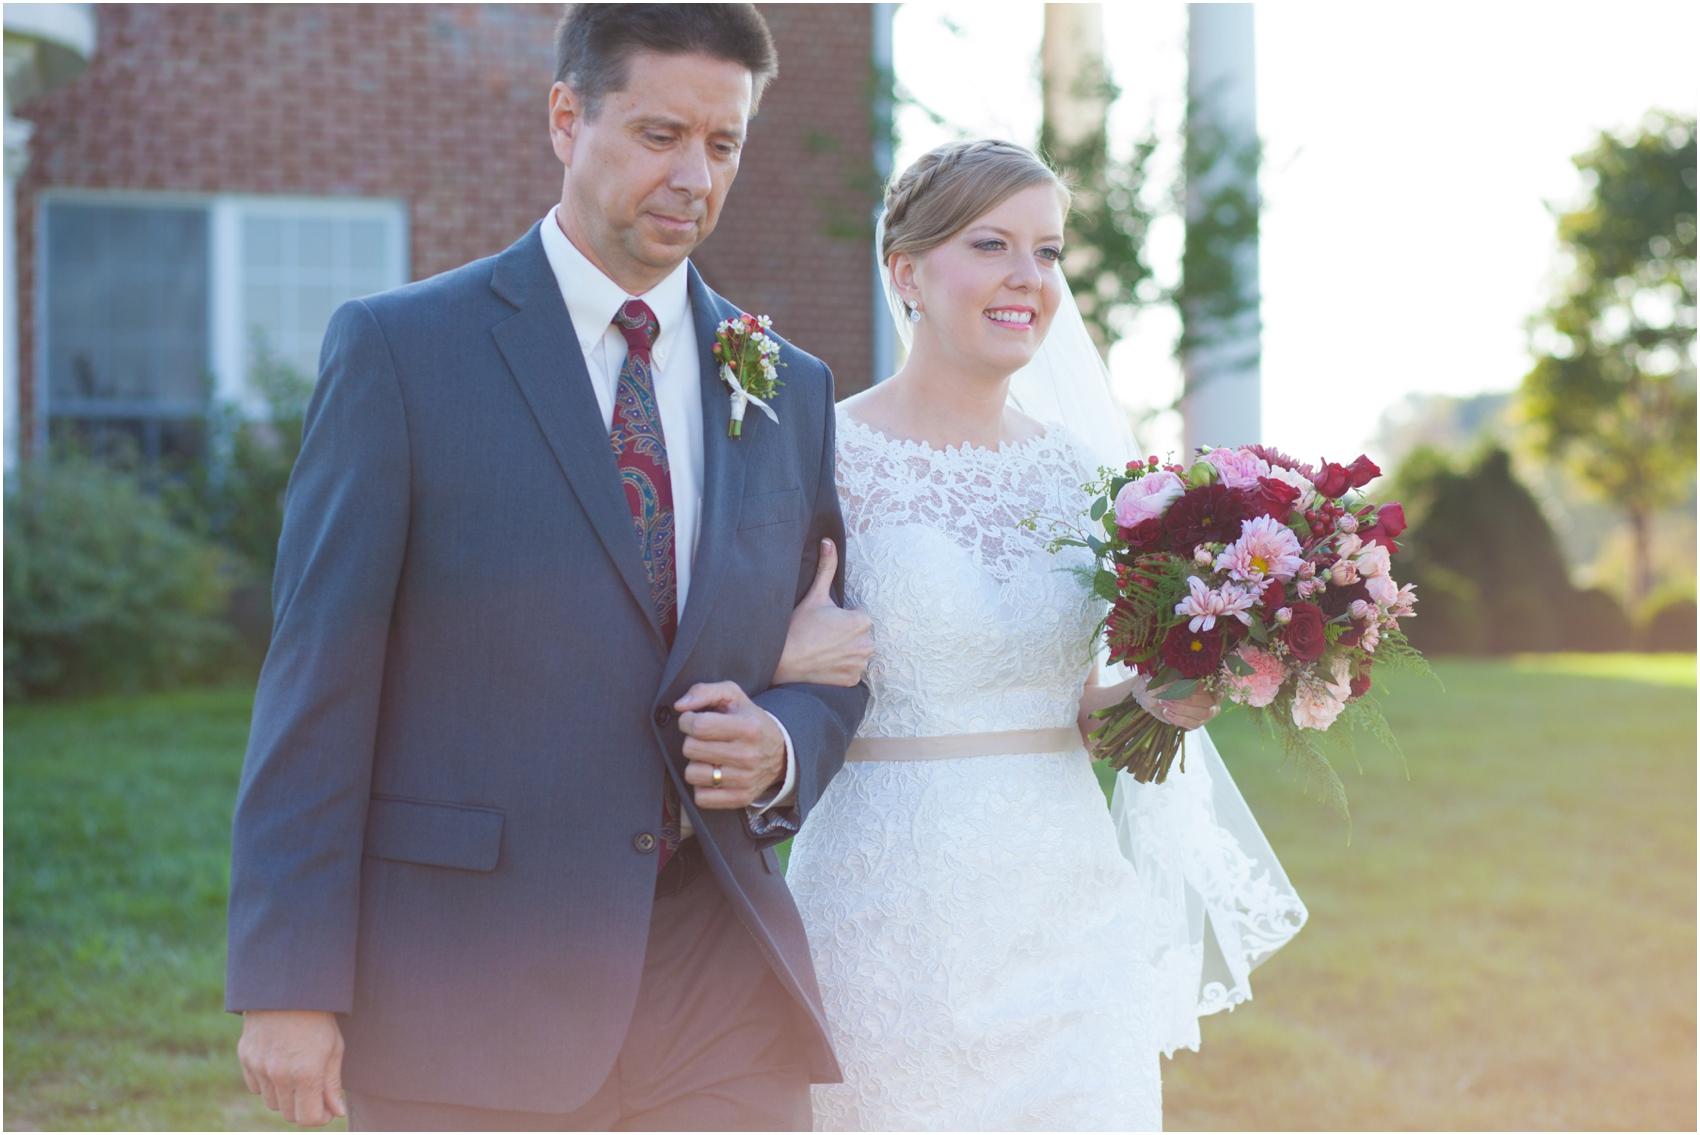 Columns-at-Six-Penny-Farm-Virginia-Fall-Wedding-8597.jpg